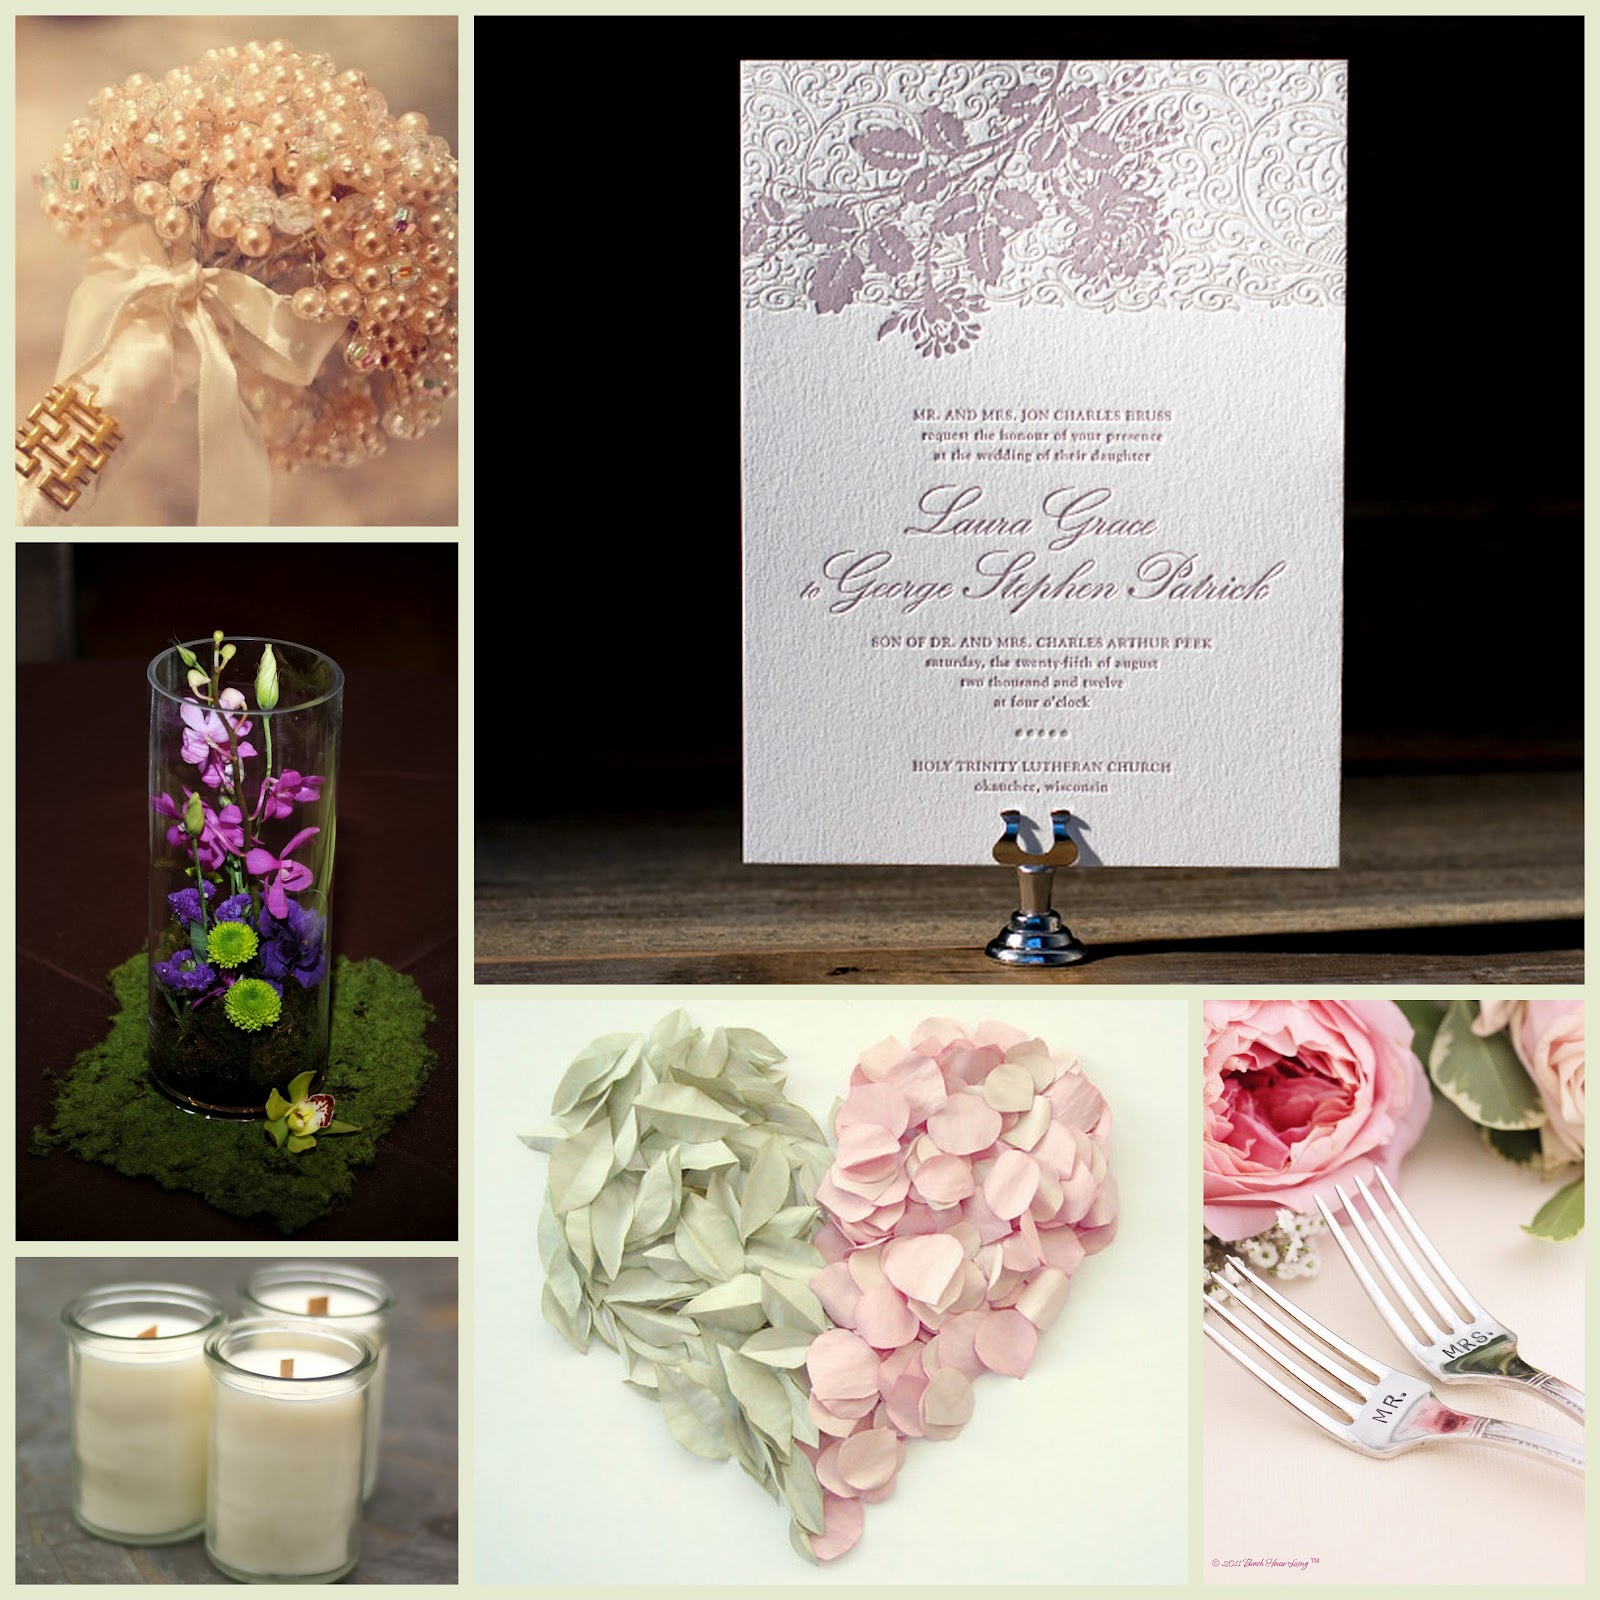 http://3.bp.blogspot.com/-A2Reg4m-jQg/UD6ypbYBLcI/AAAAAAAAHhM/-OVhH6__ggU/s1600/eco+chic+wedding.jpg